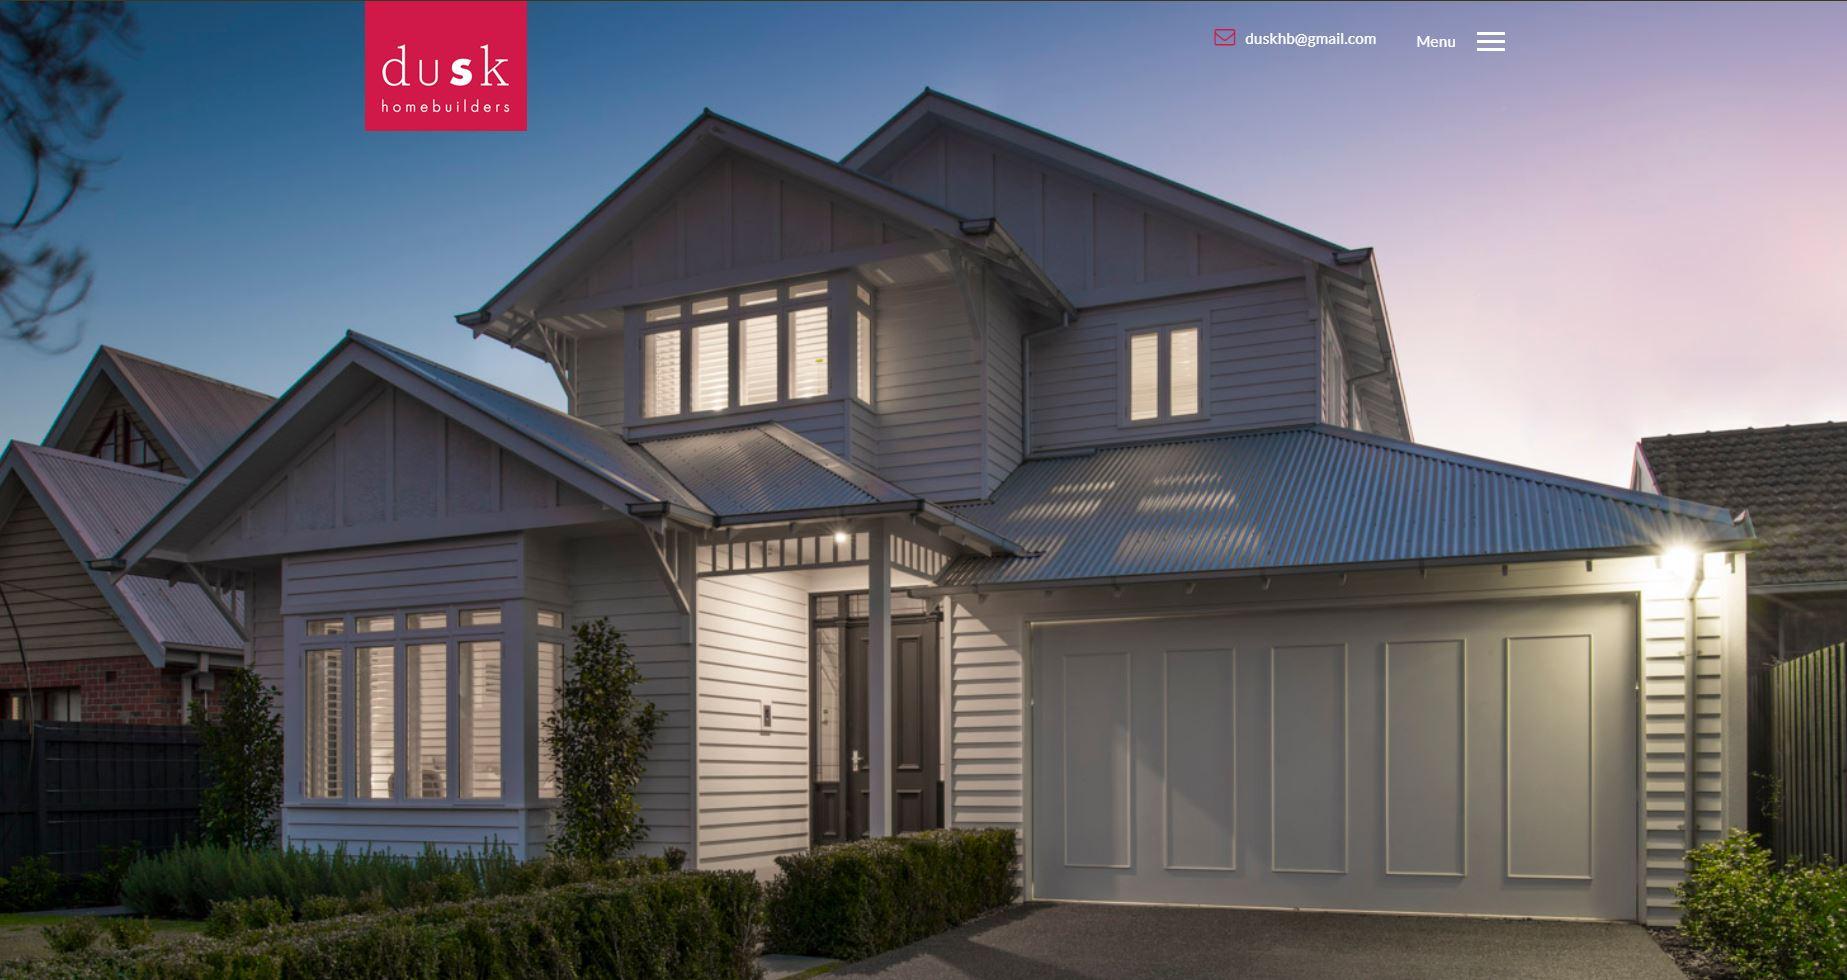 Dusk Home Builders